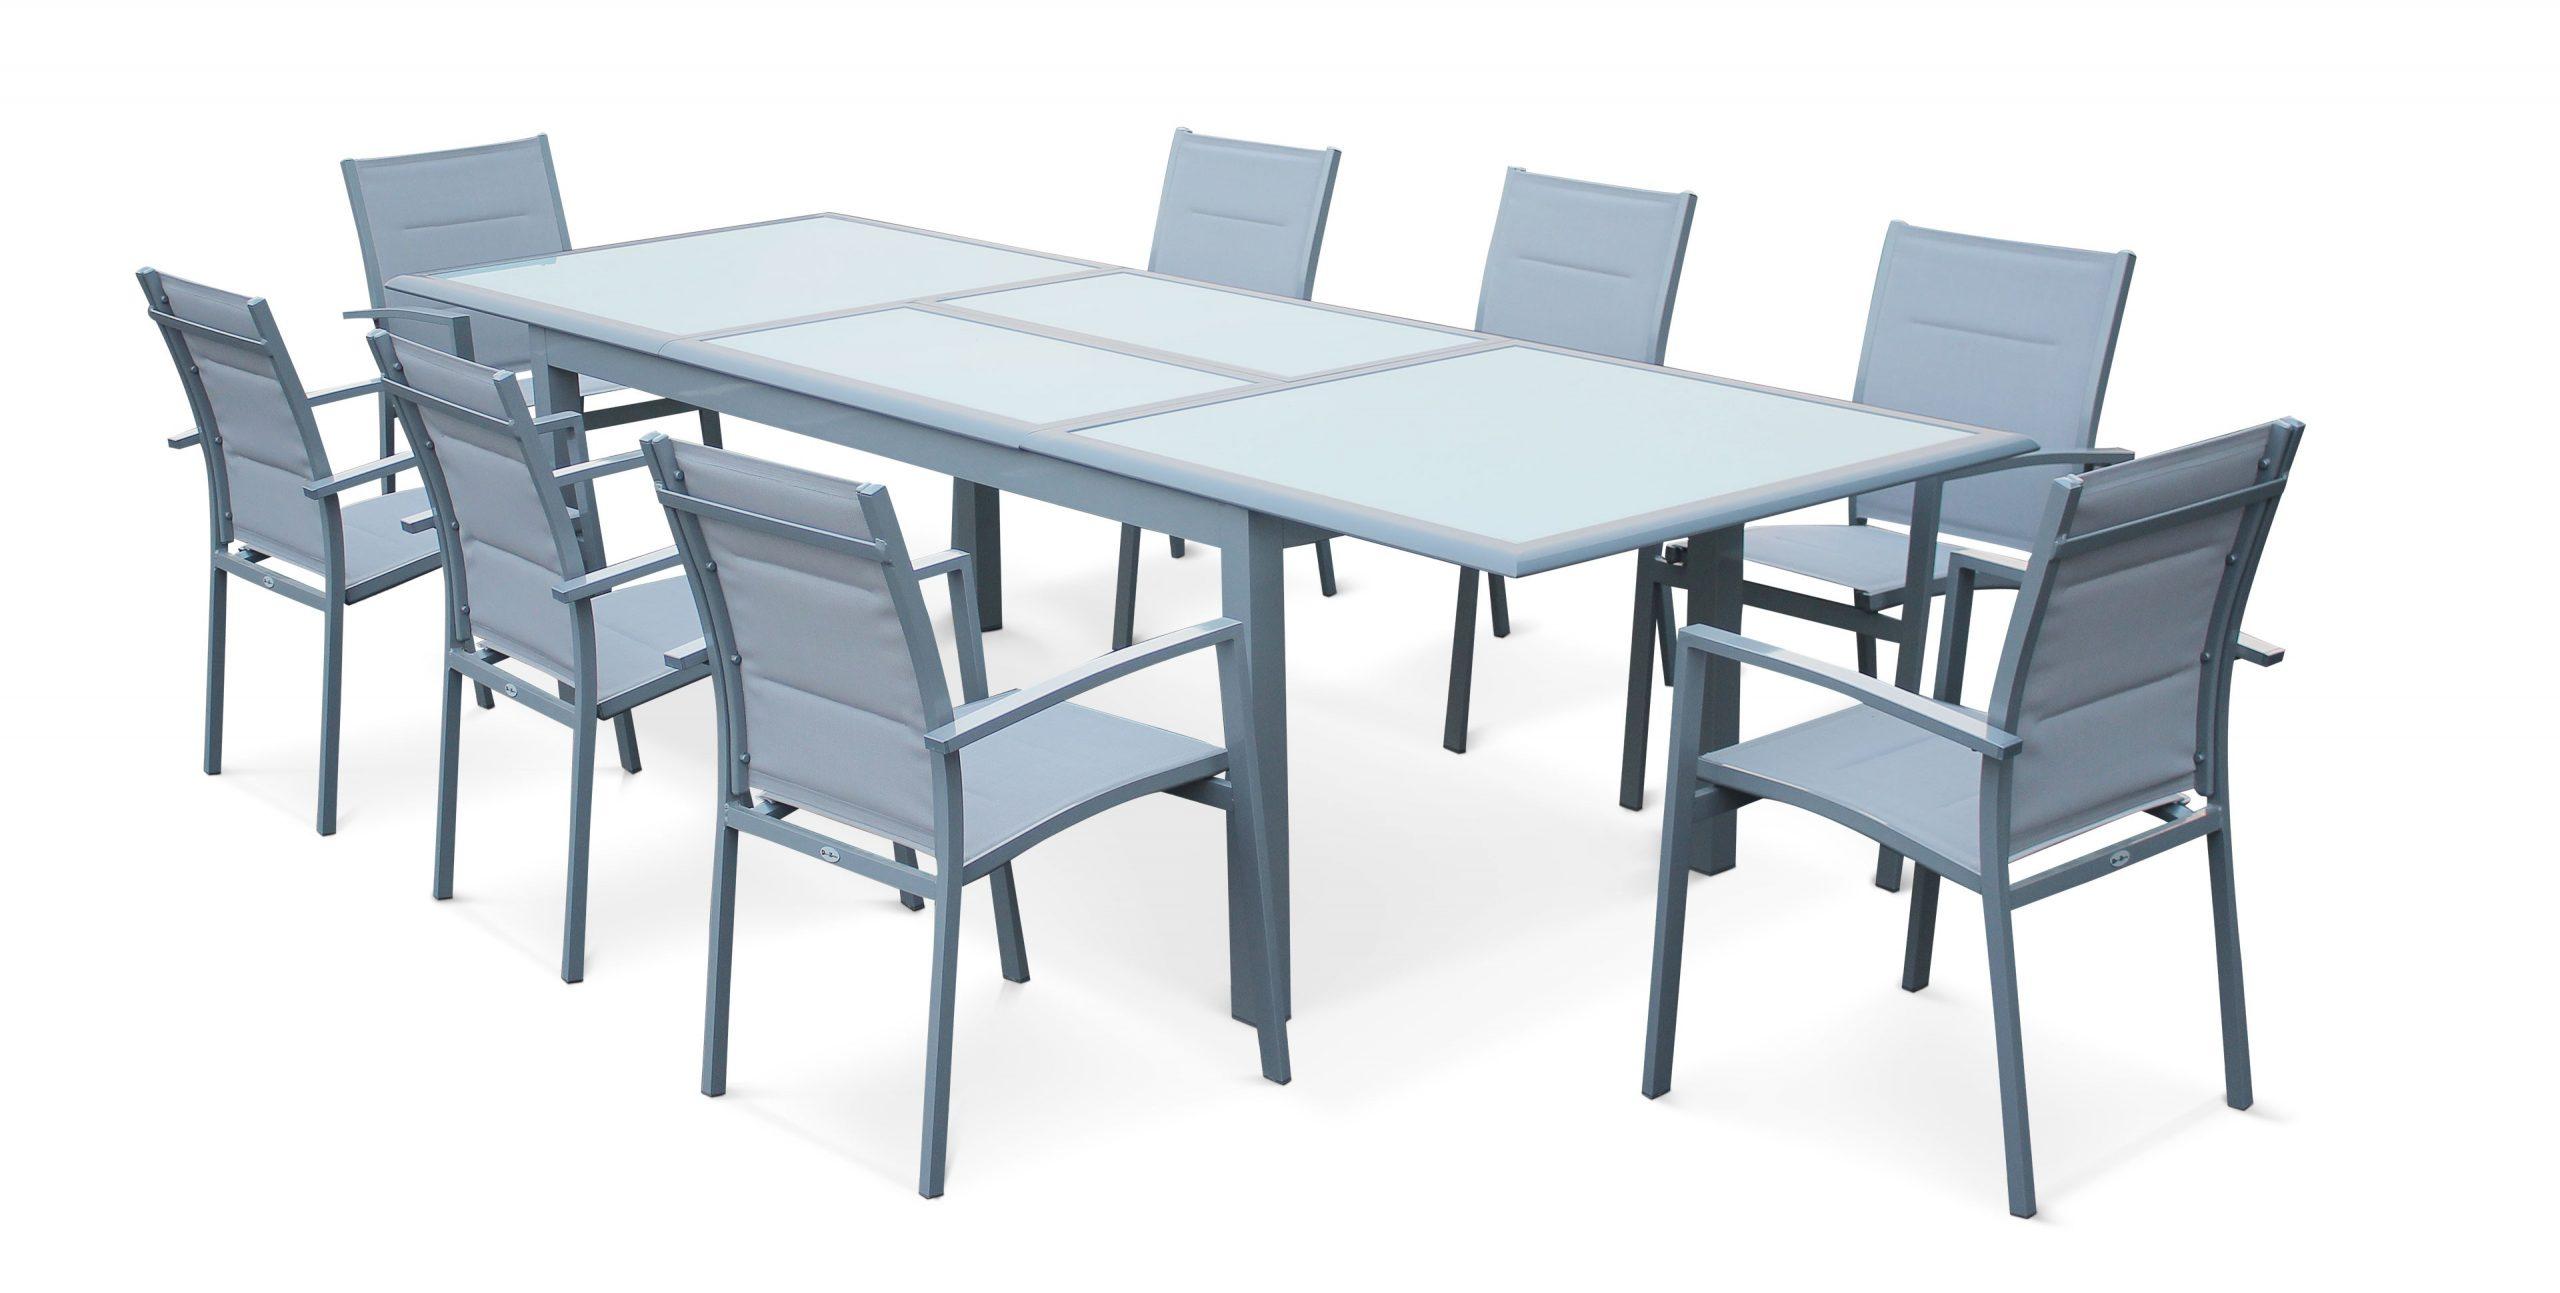 Table De Jardin Extensible Luxury Table Jardin Extensible ... destiné Table De Jardin Extensible